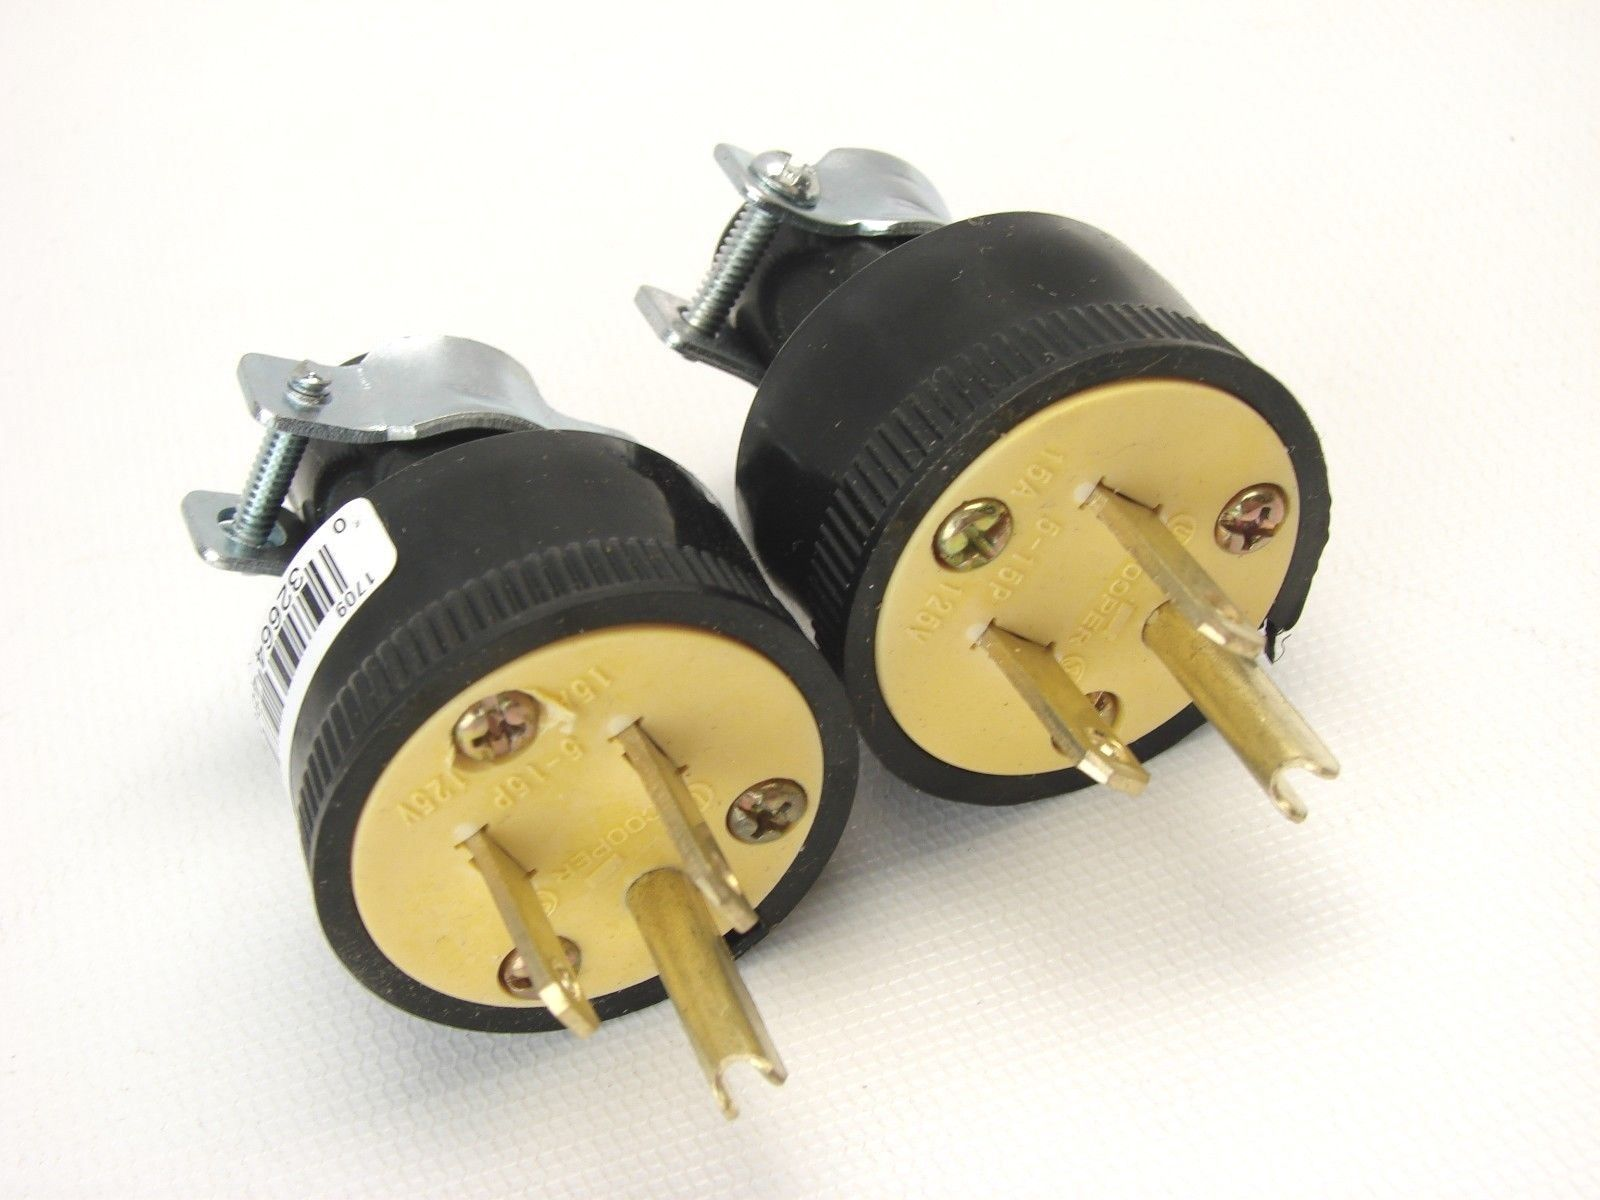 Arrow-Hart 6485 3-Wire Mini Male Locking Connector Cap Plug 125V 15A t12